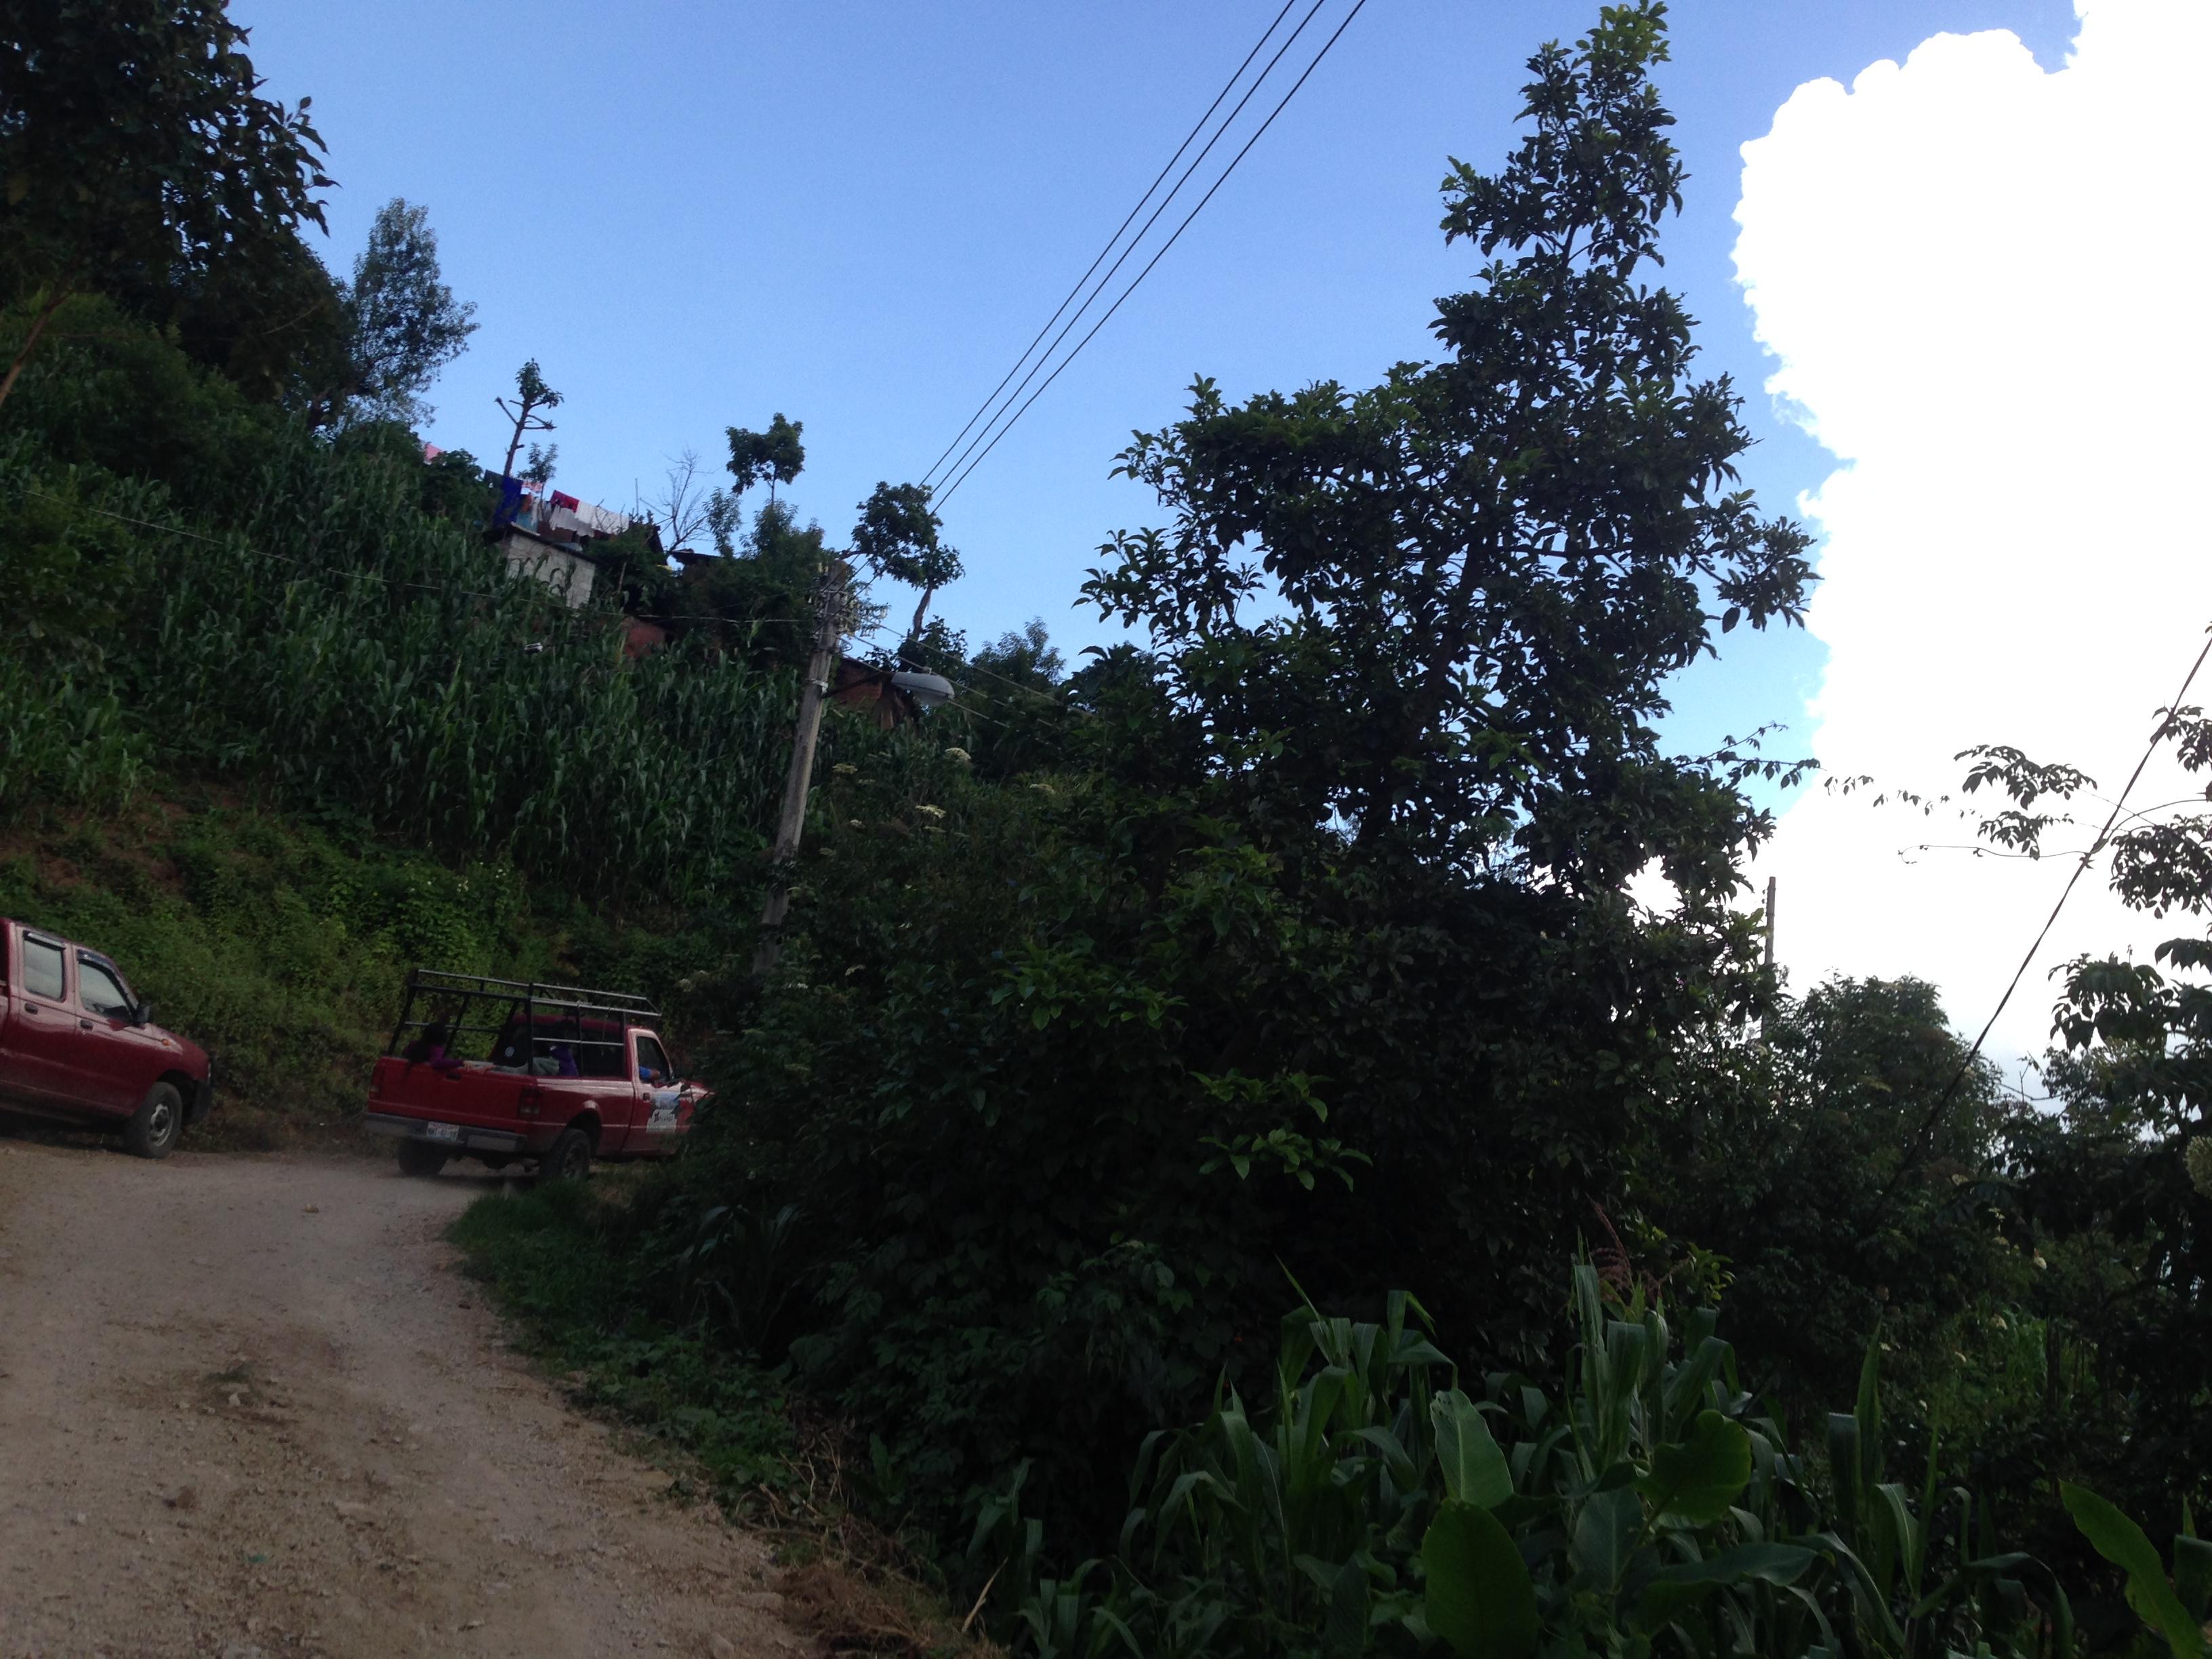 Santa María Tlahuitoltepec